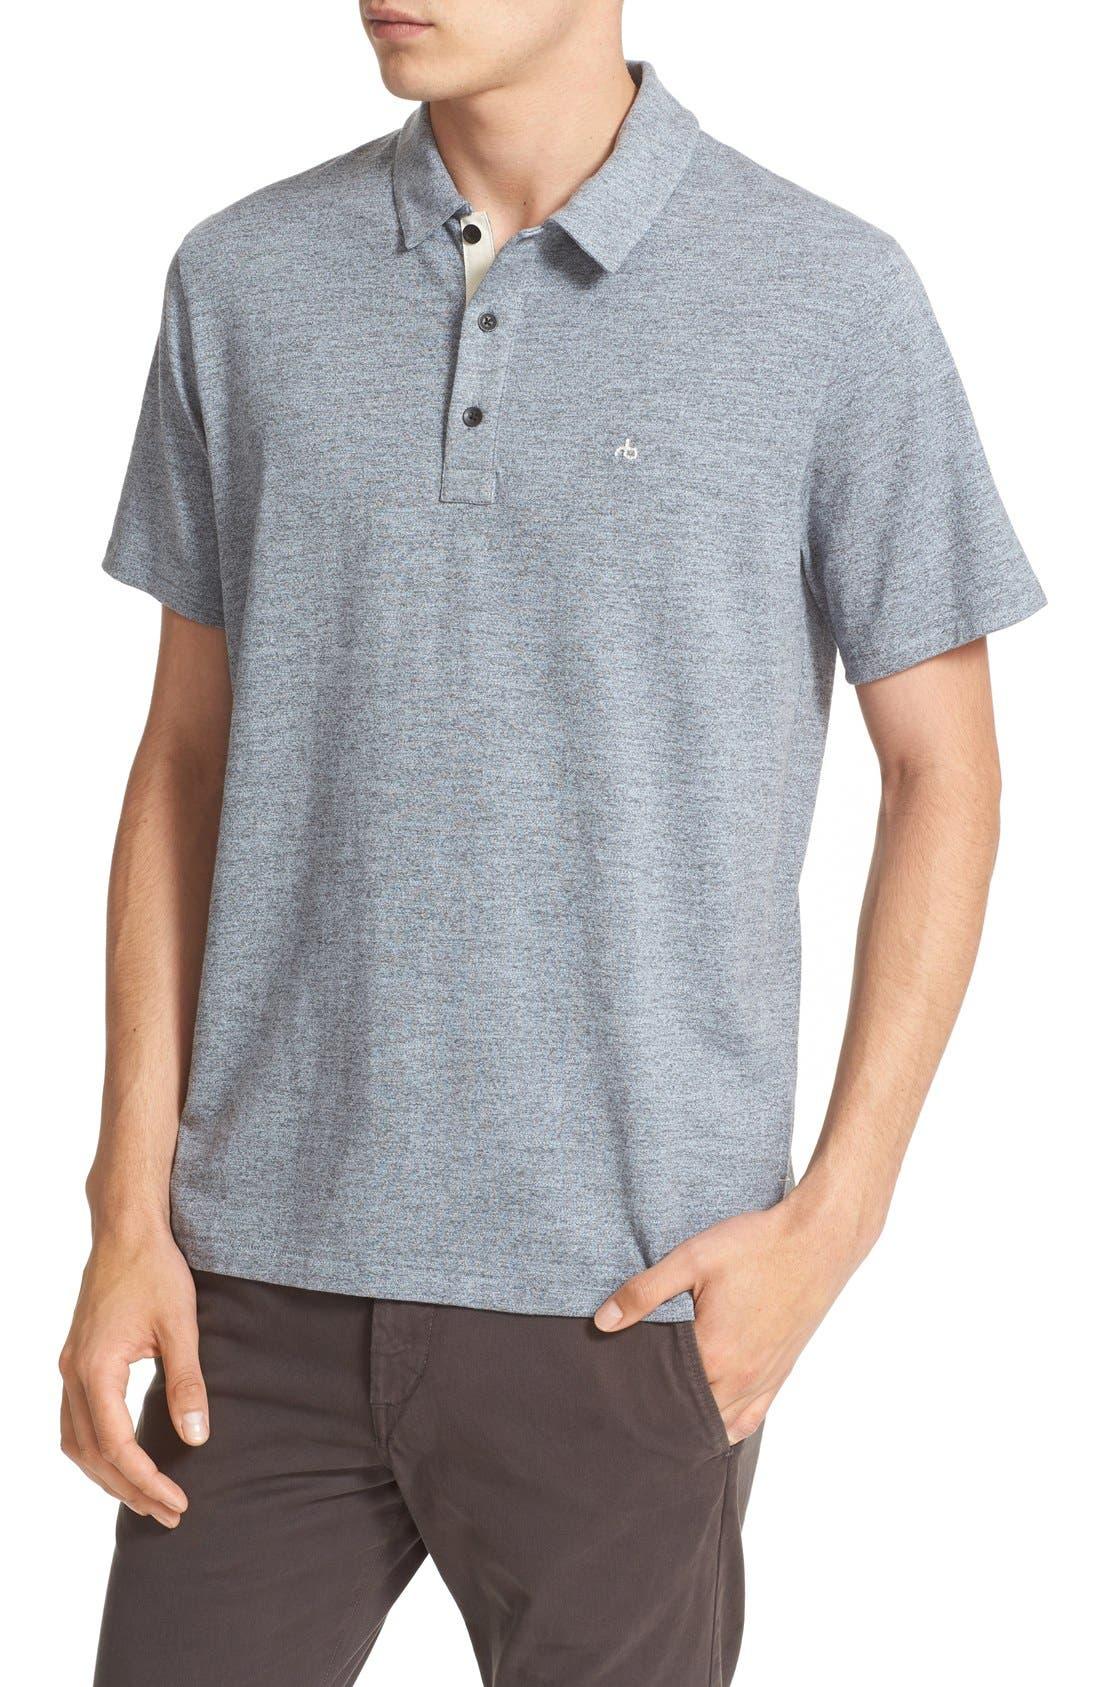 Alternate Image 4  - rag & bone Standard Issue Regular Fit Slub Cotton Polo